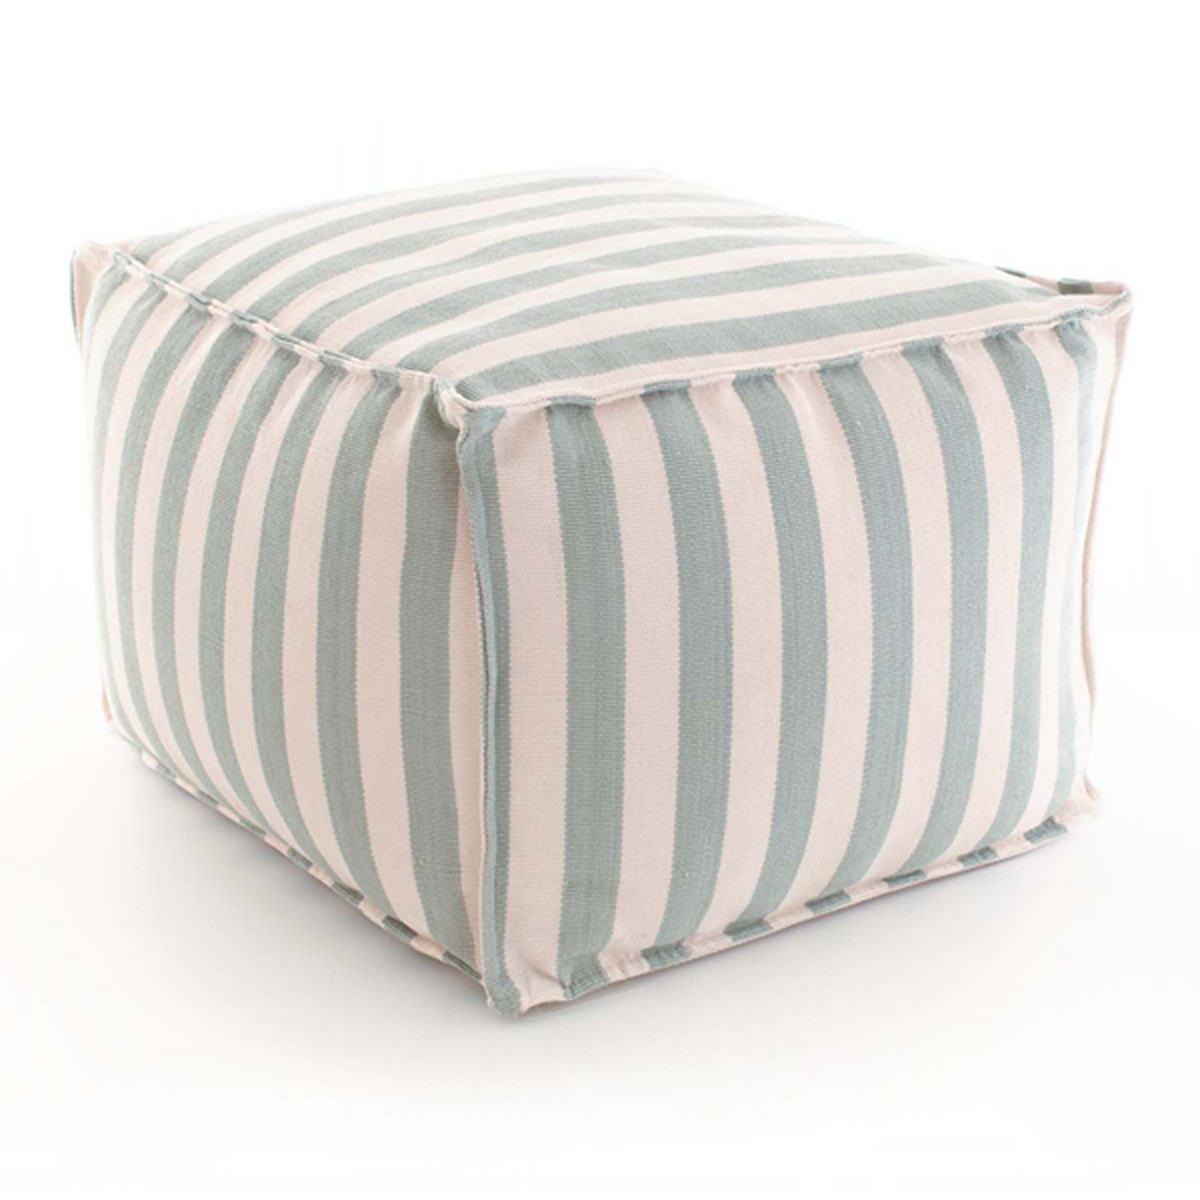 Fresh American Trimaran Stripe Light Blue/Ivory Indoor/Outdoor Pouf